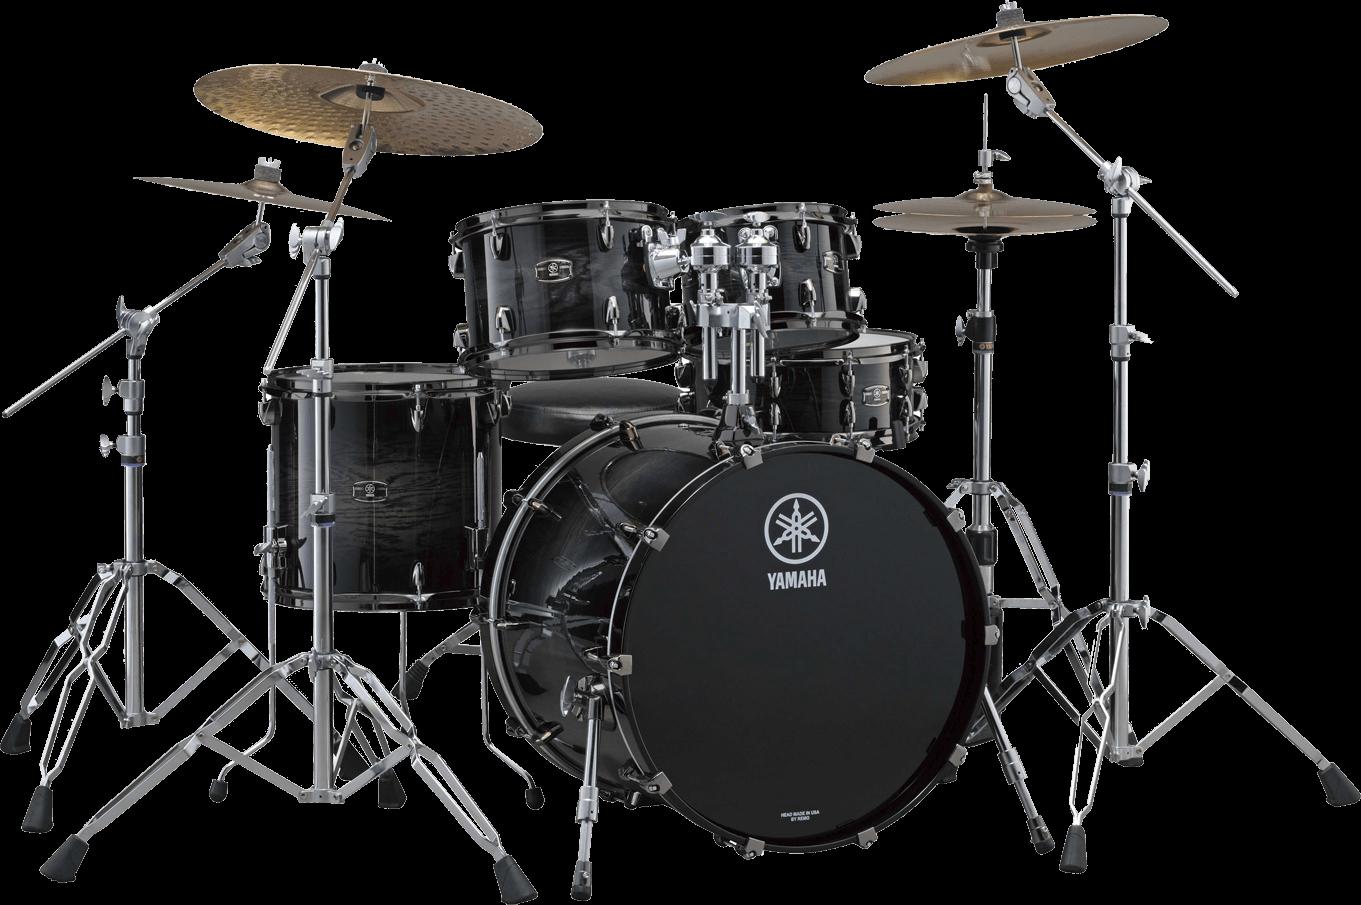 Drums clipart transparent background. Black yamaha png stickpng